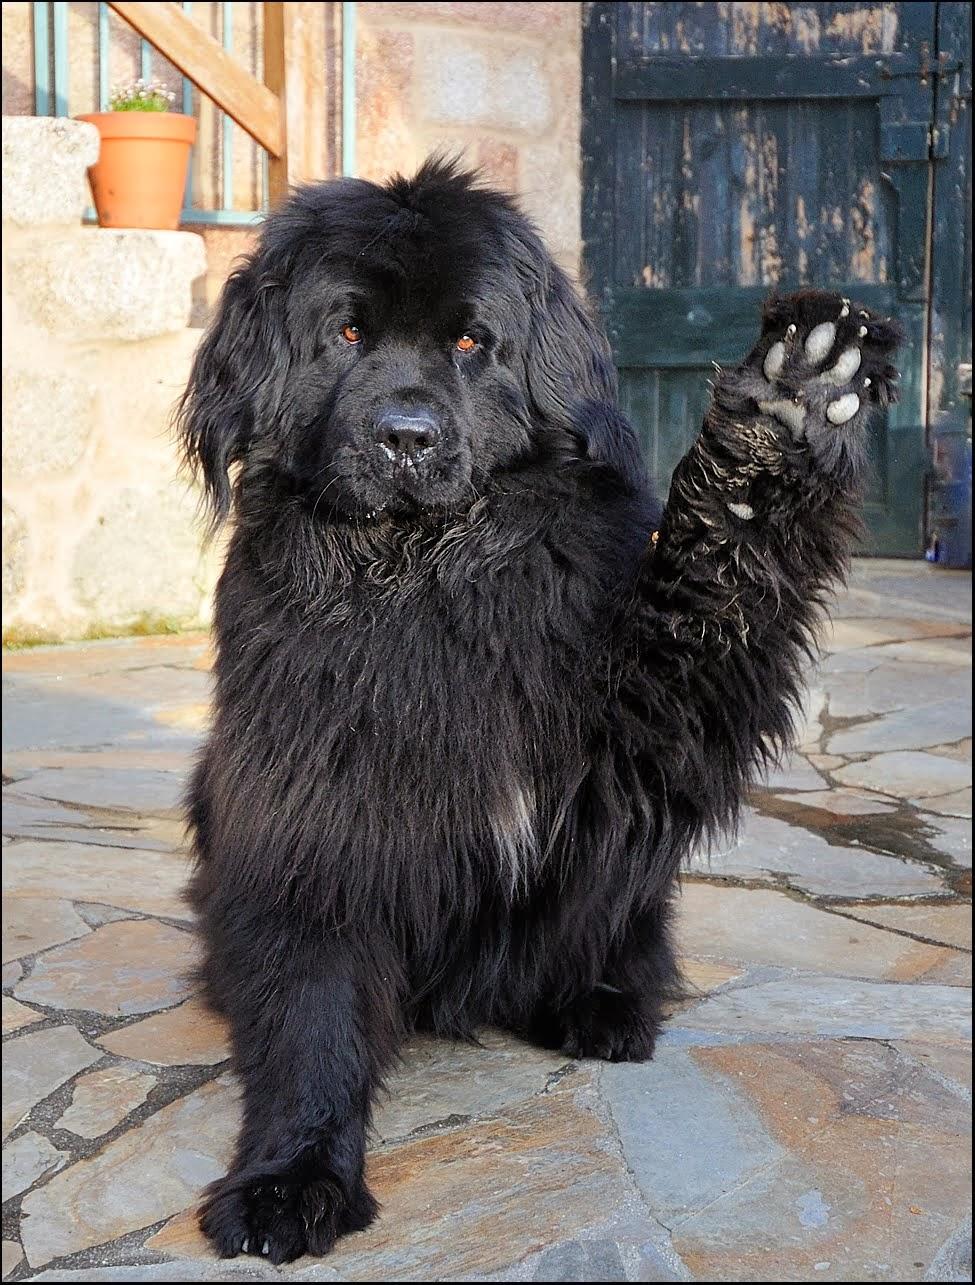 Decálogo del perro viajero